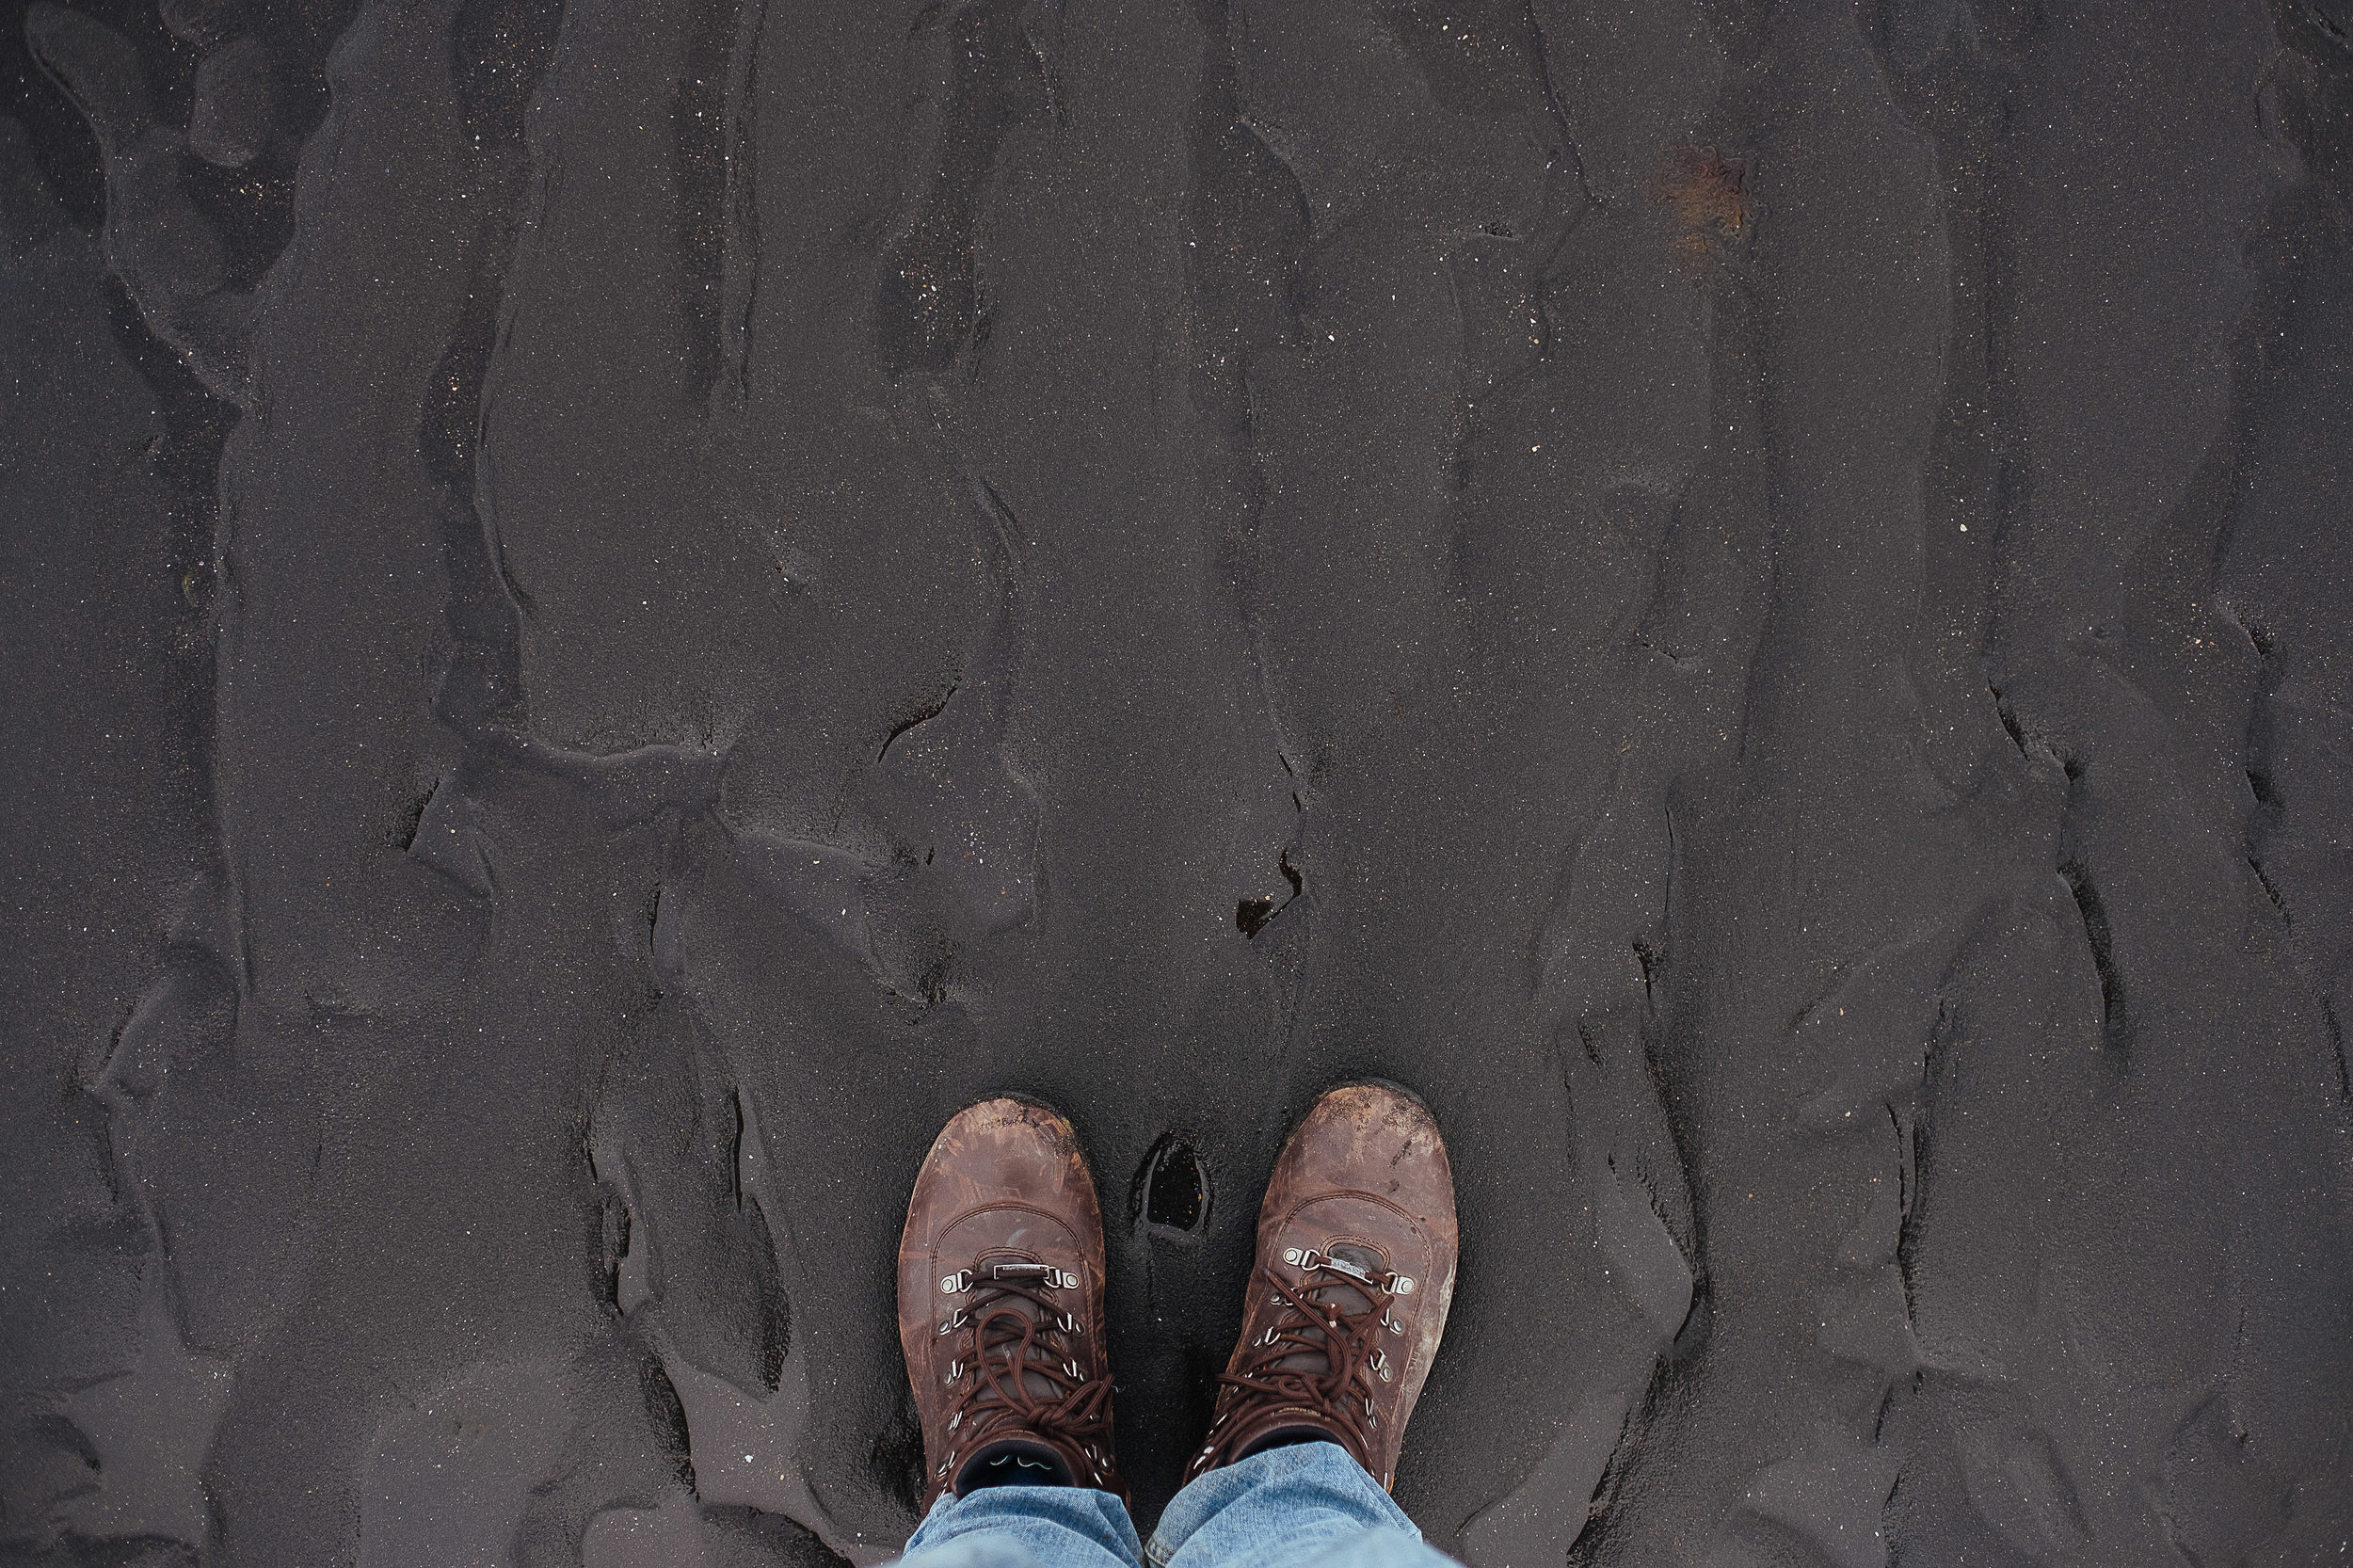 iceland feet-29.jpg